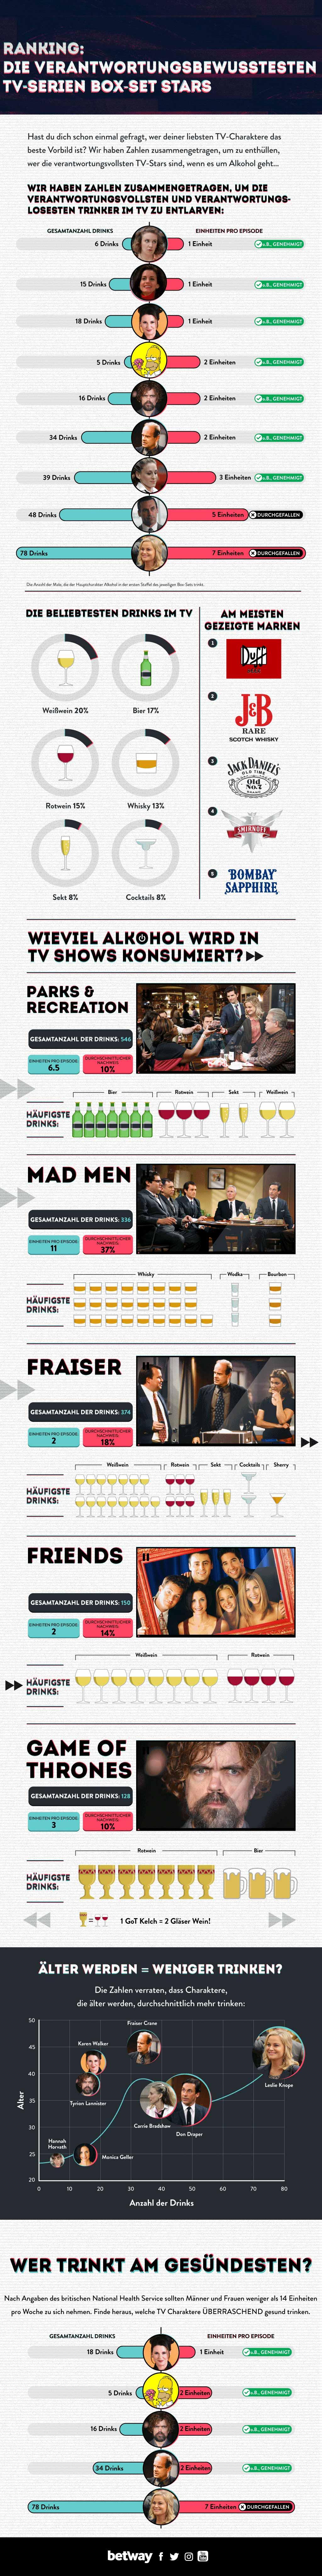 Welche Seriencharaktere trinken besonders viel? infografik-wieviel-alkohol-trinken-serienfiguren